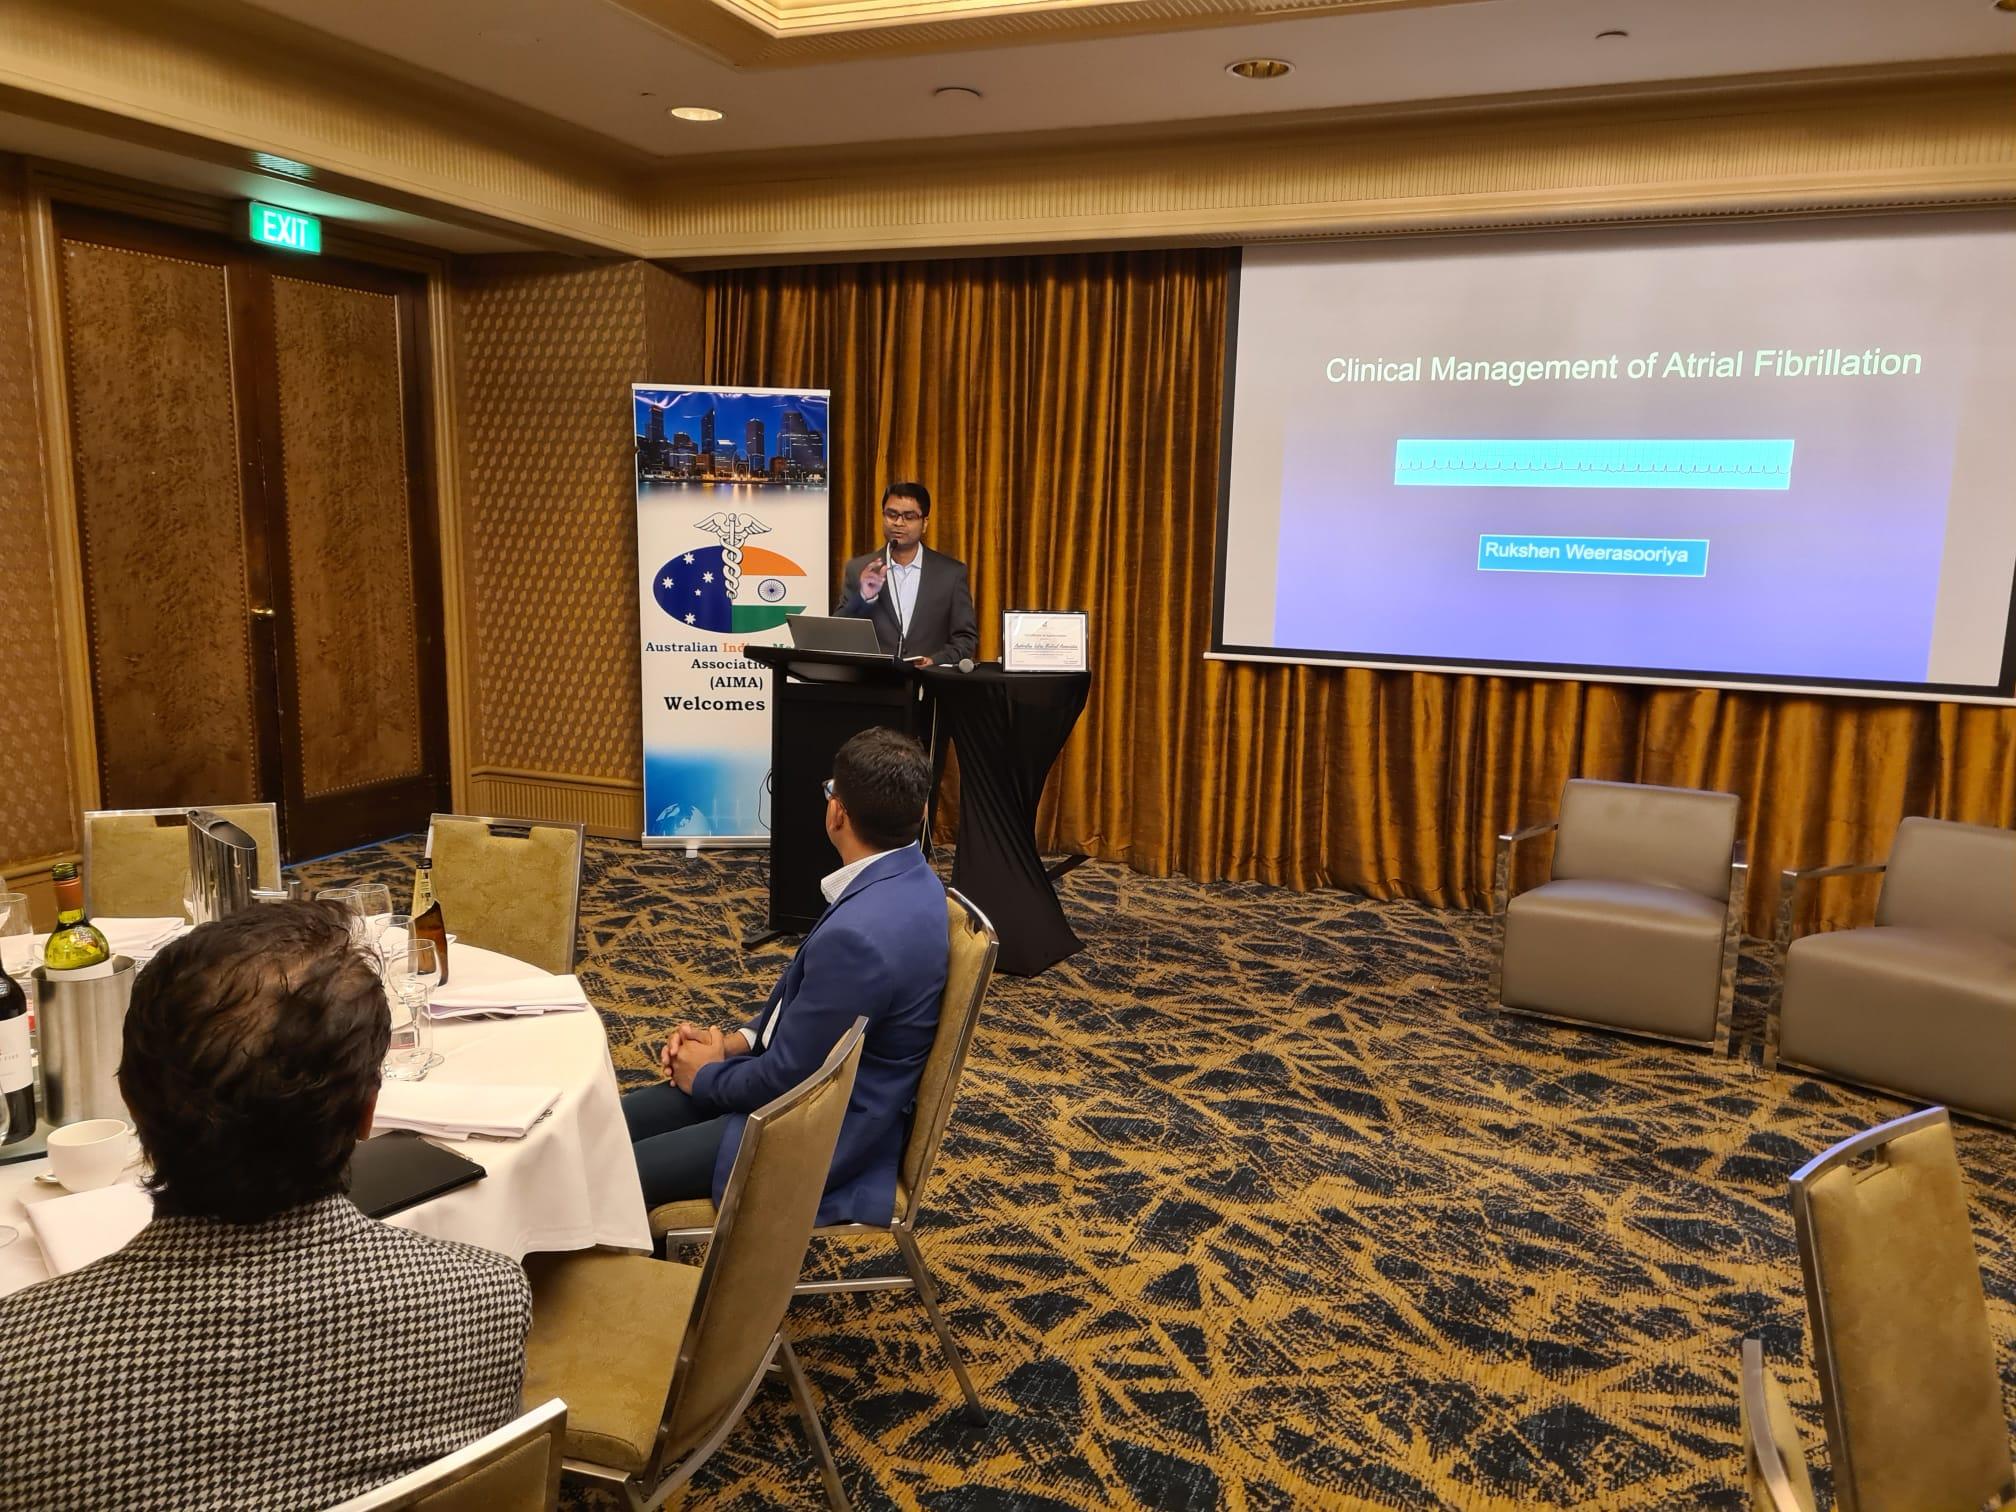 AIMA WA Educational talk Management of Atrial Fibrillations by Catheter ablation  on 17th June Hyatt Perth